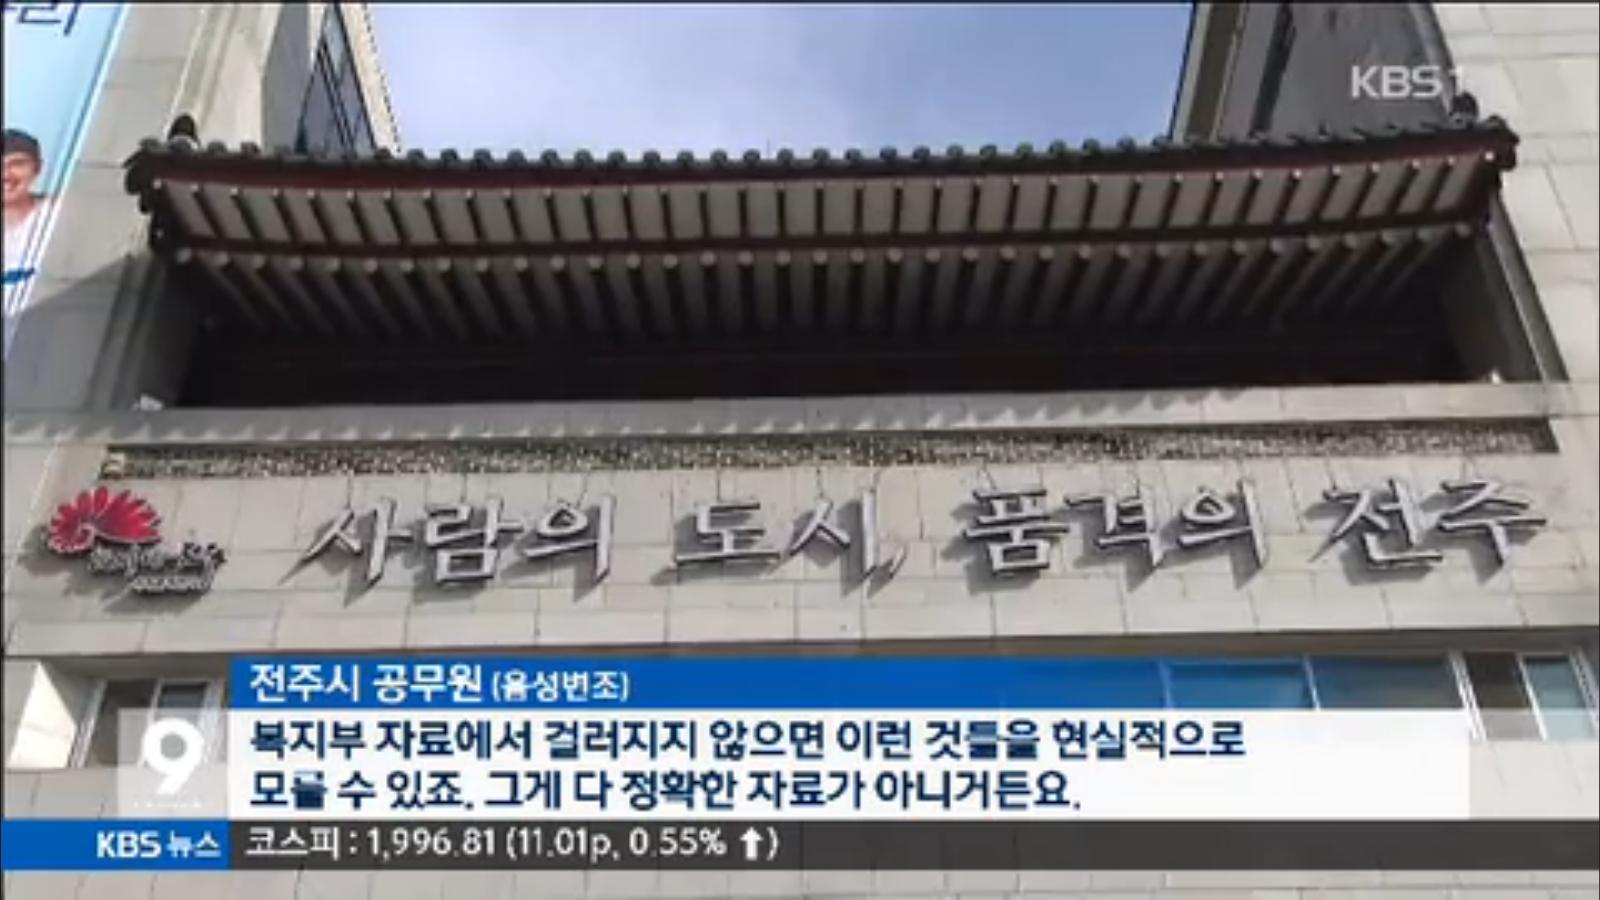 [15.3.2 KBS전주] 전주시, 빈곤층 울리는 허술한 복지행정3.jpg